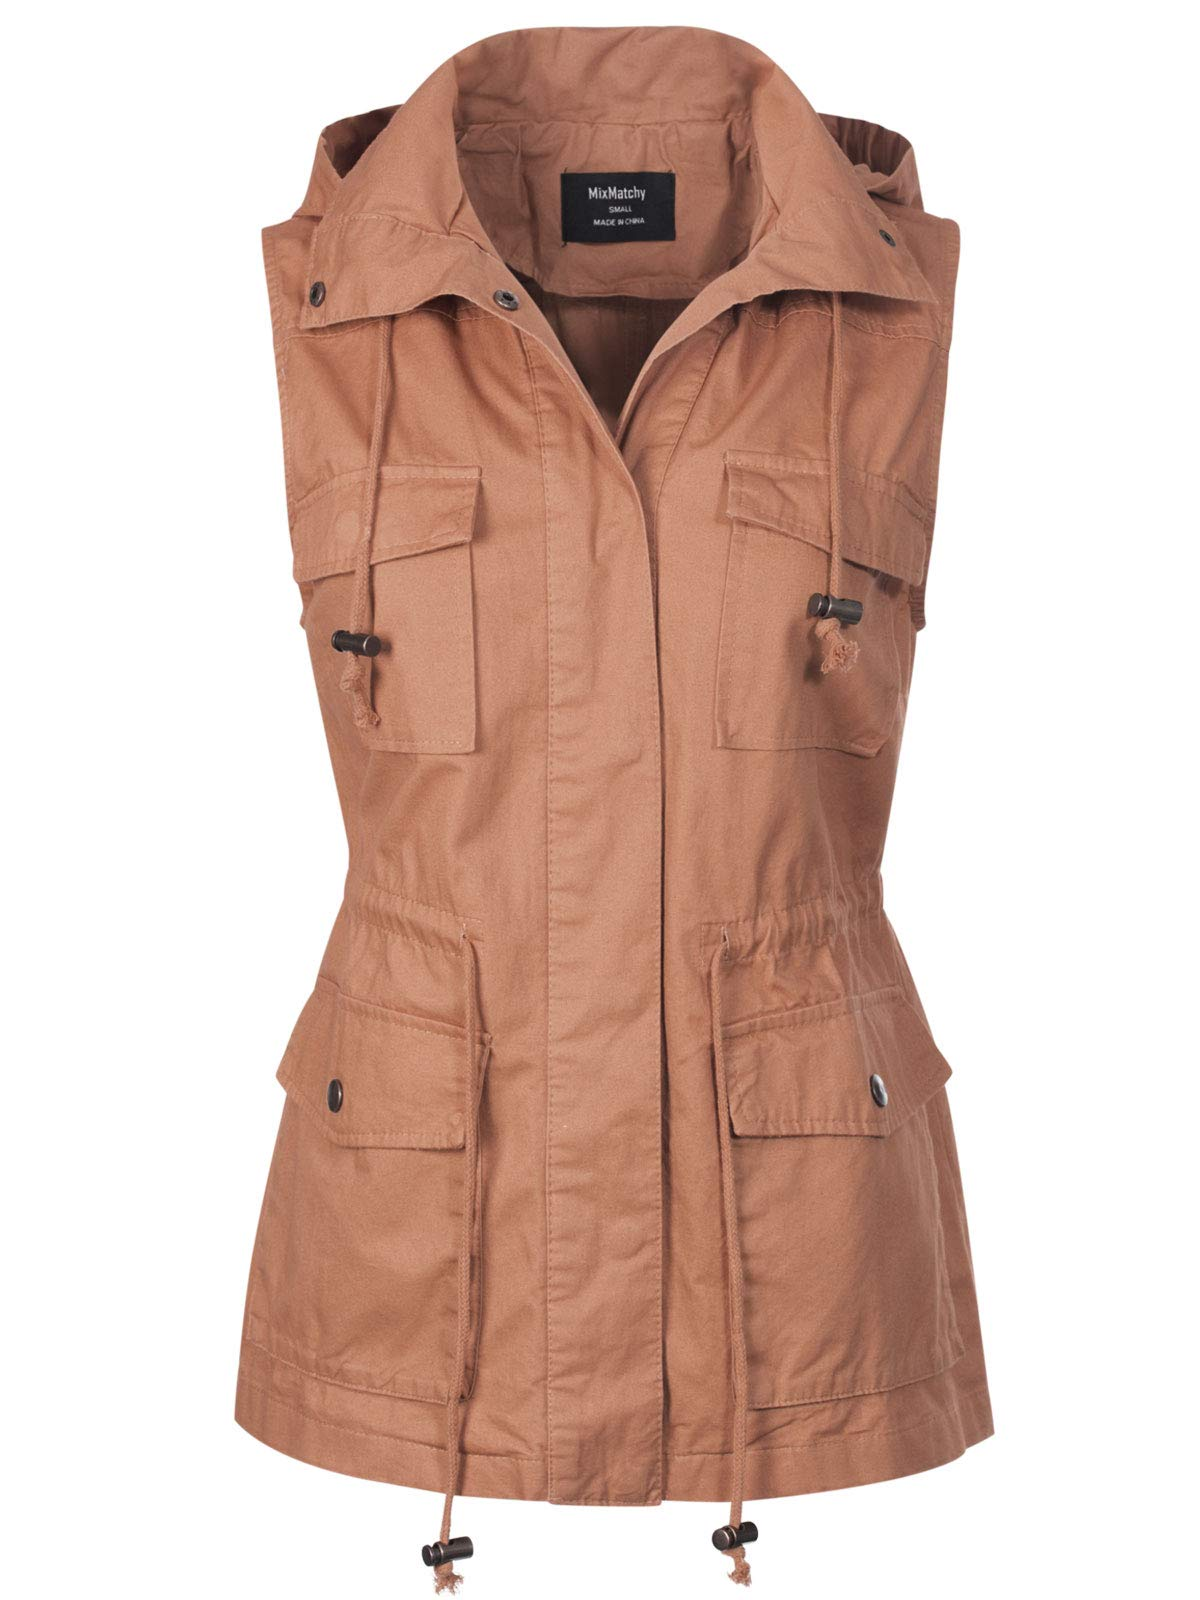 MixMatchy Women's Drawstring Lightweight Loose Fit Sleeveless Vest Utility Jacket Taupe 2XL by MixMatchy